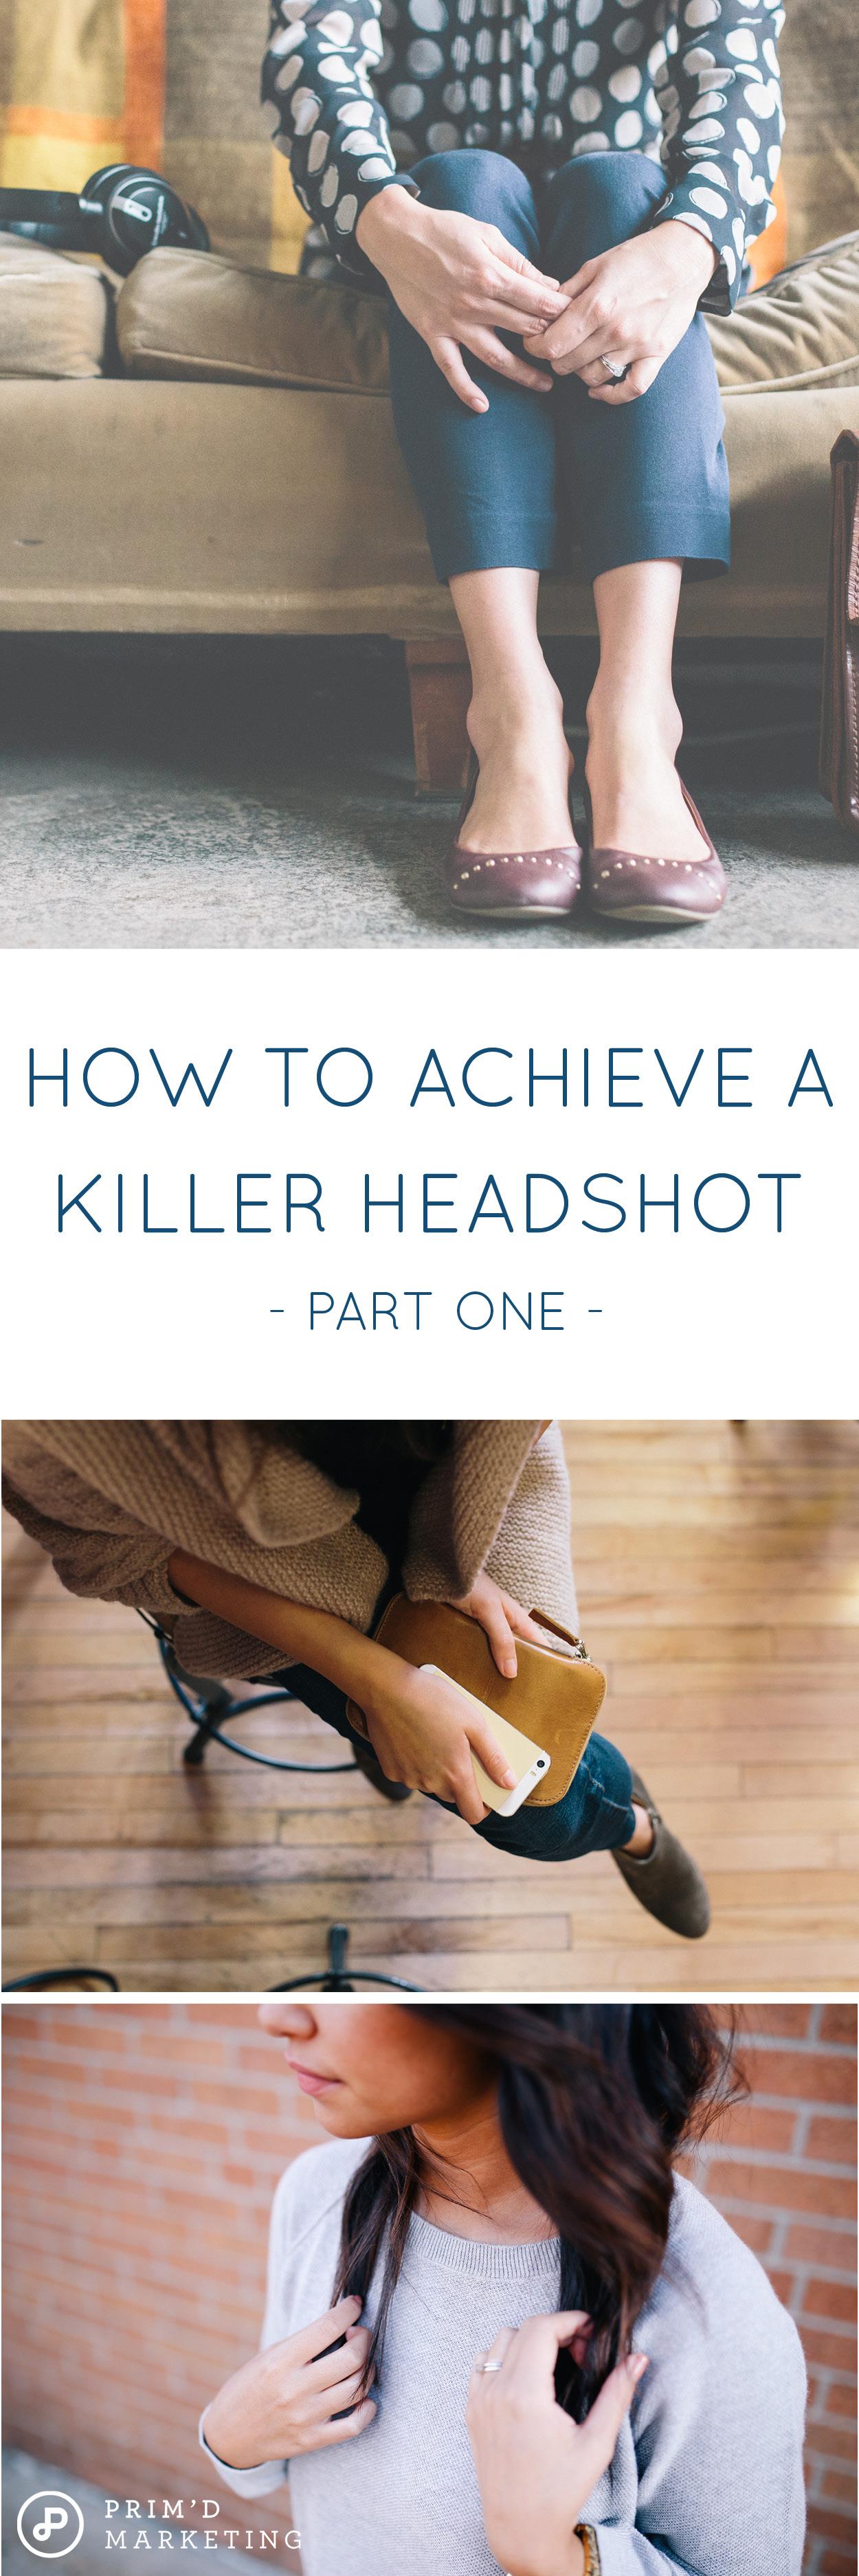 How To Achieve A Killer Headshot (part 1)